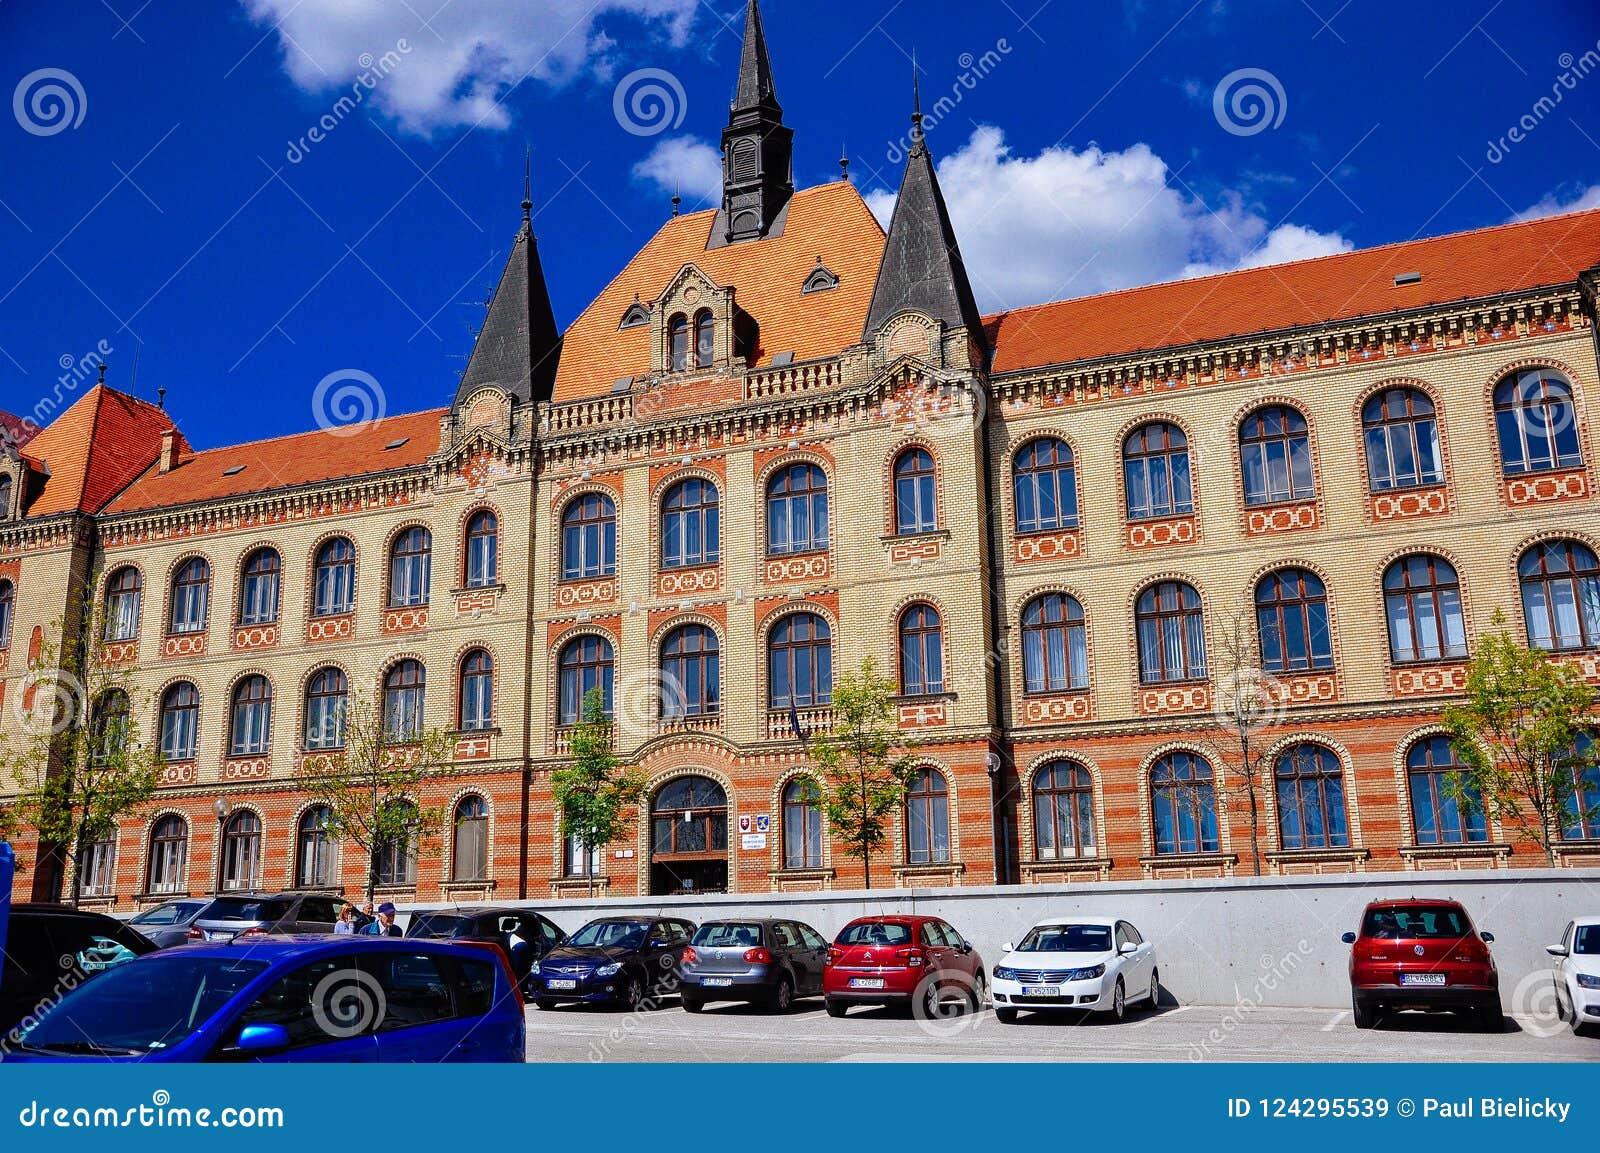 The building of the state engineering high school Fajnorovo nábrežie, Bratislava, Slovakia.